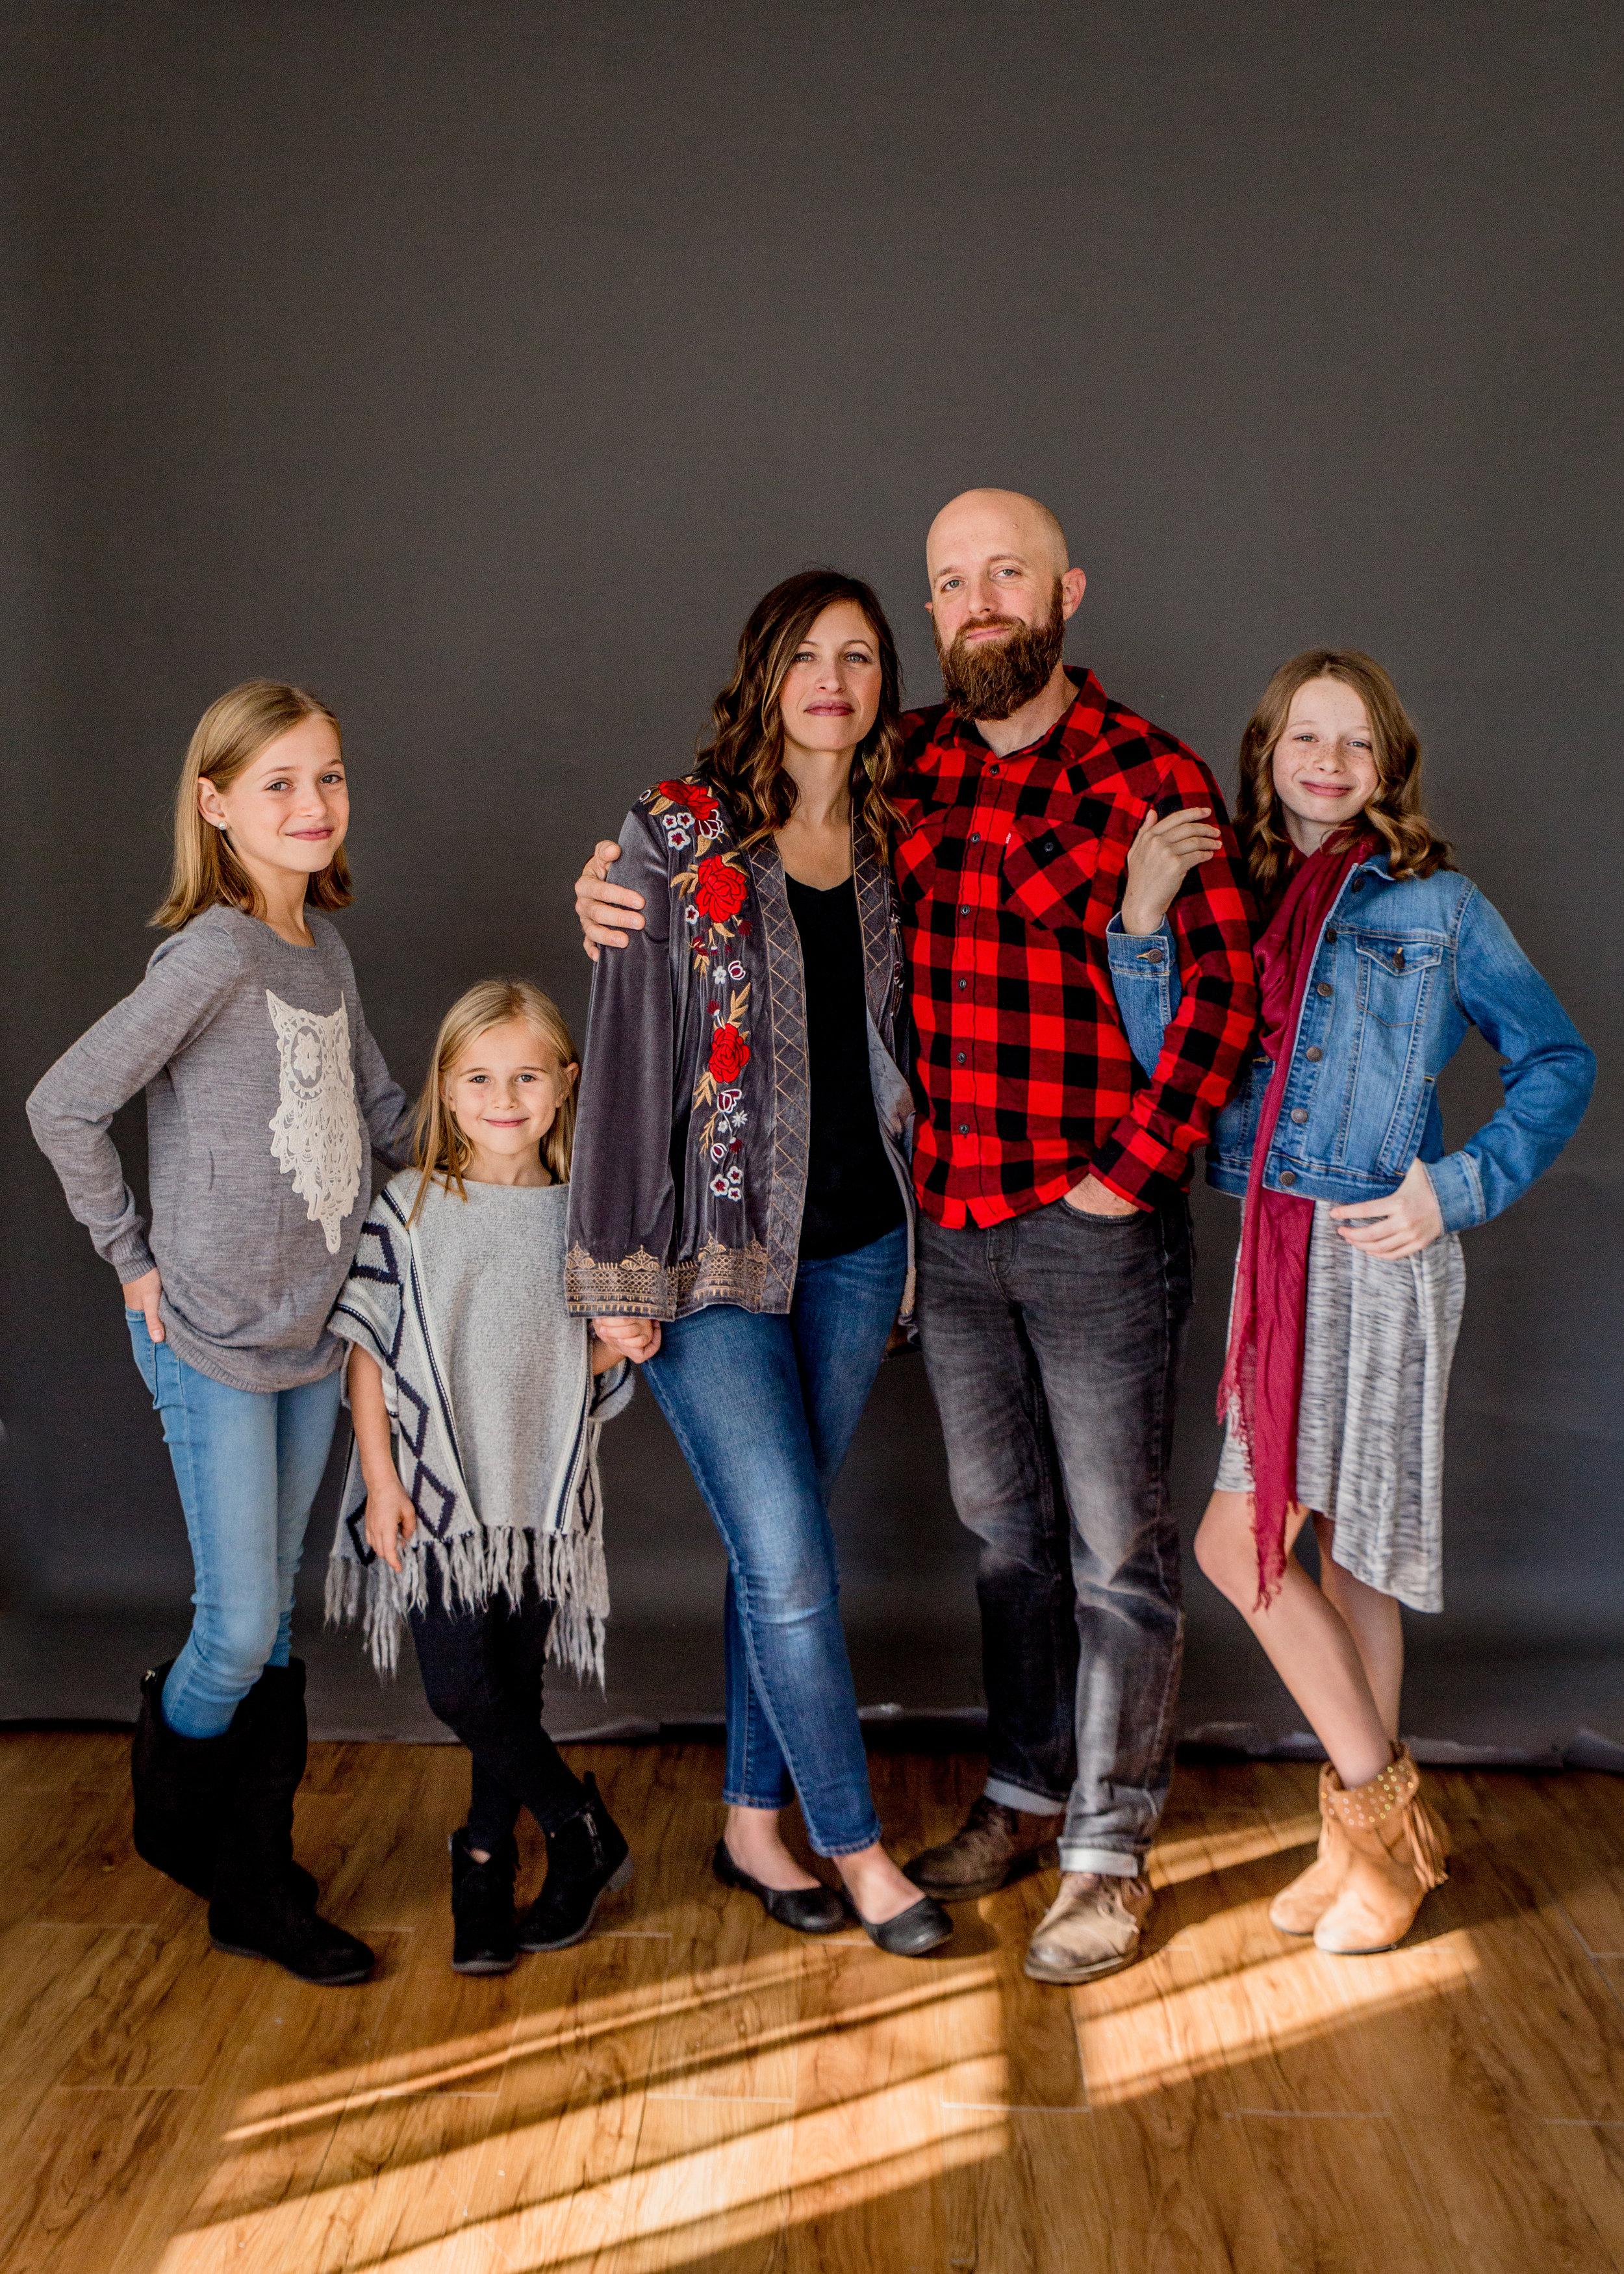 standrodfamily2018-24.jpg